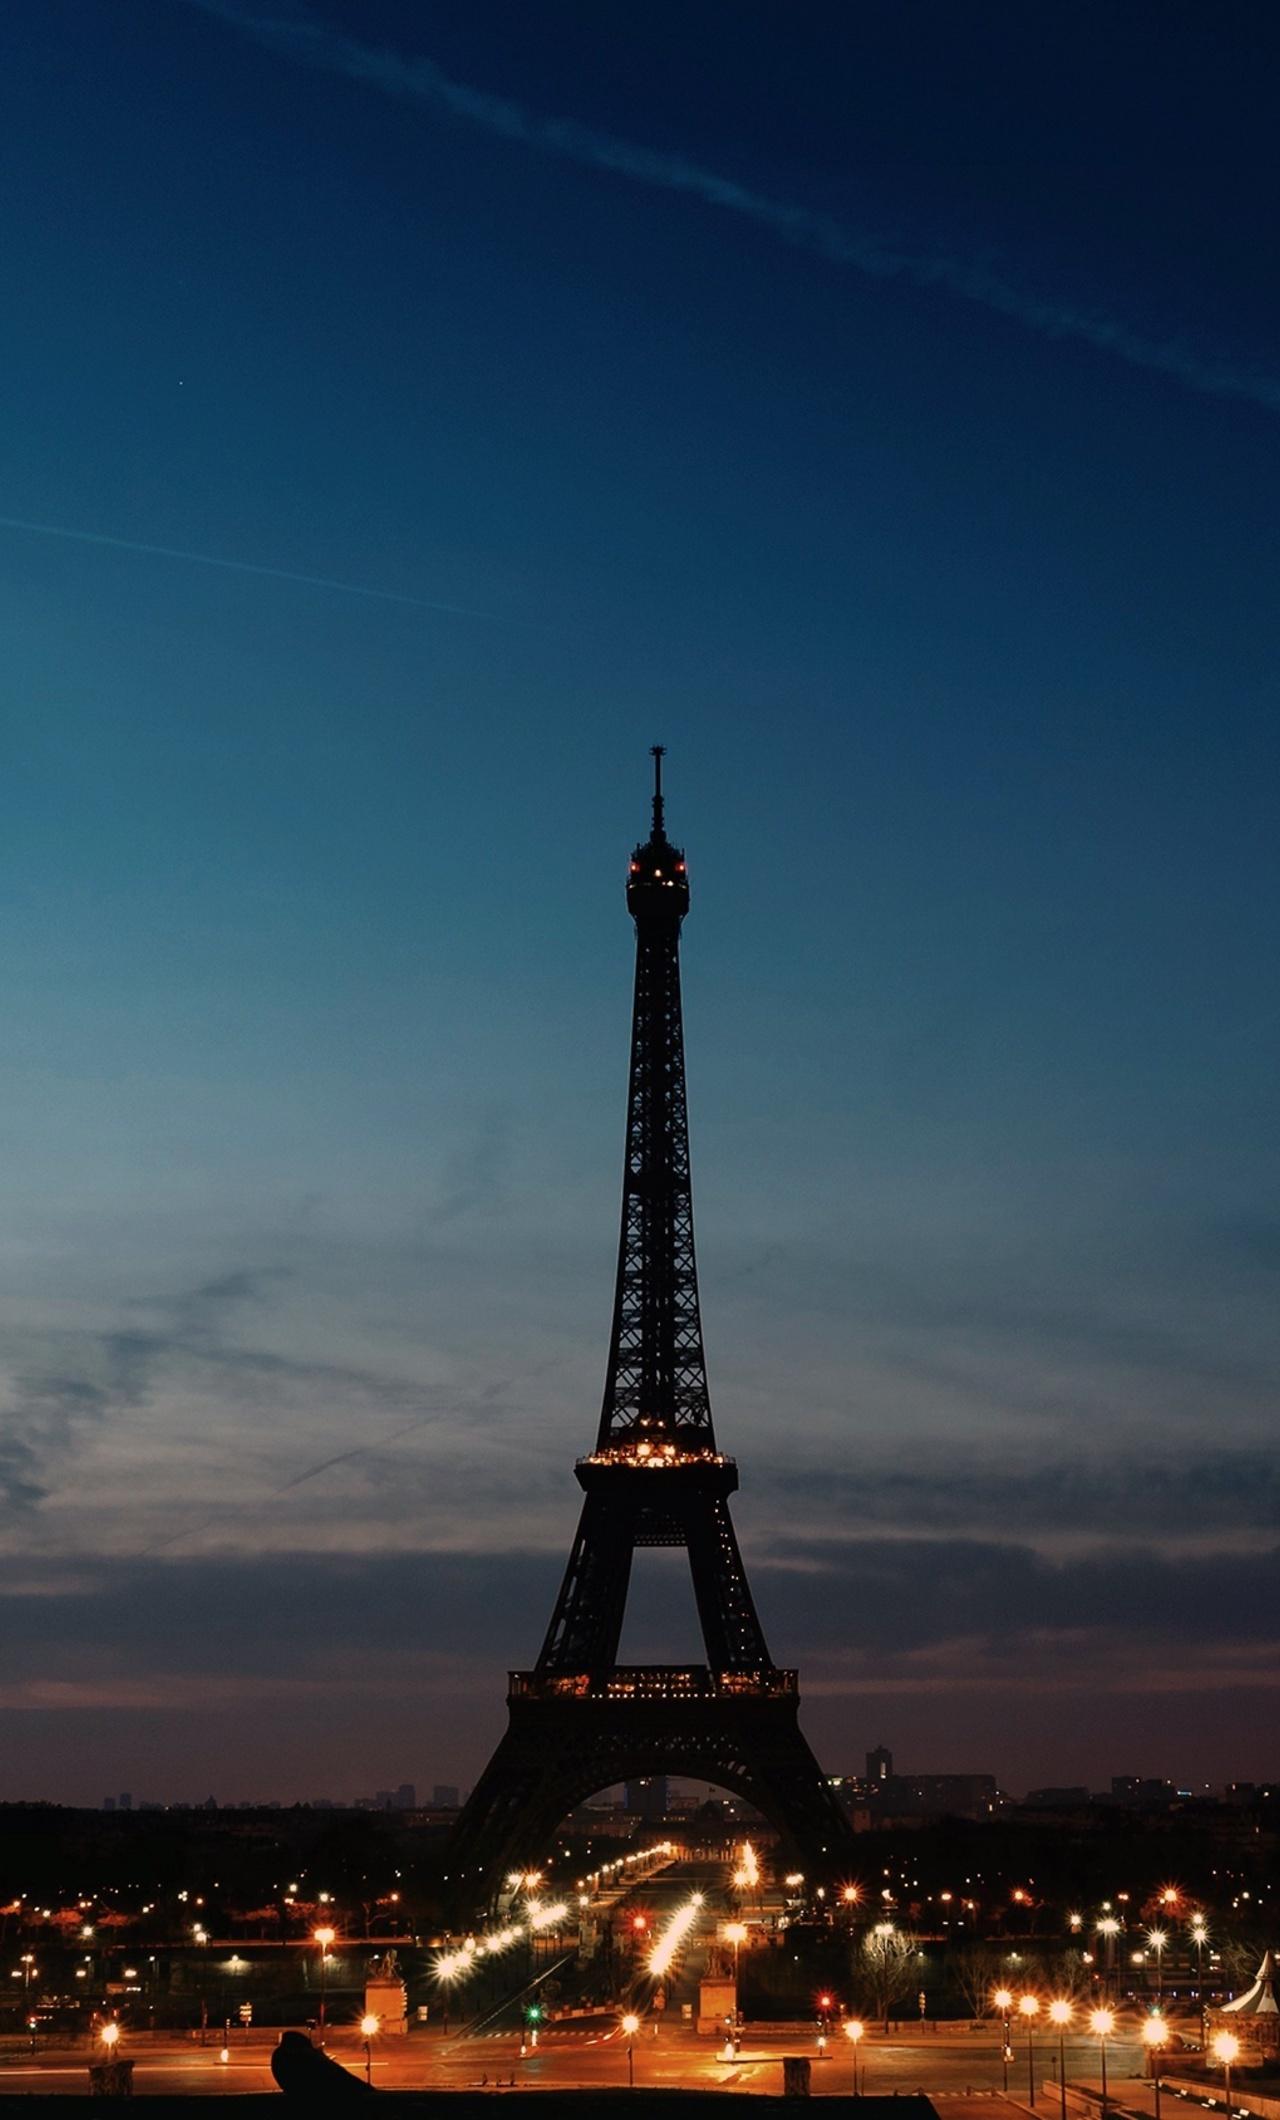 1280x2120 Eiffel Tower Night Time Clear Sky Iphone 6 Hd 4k